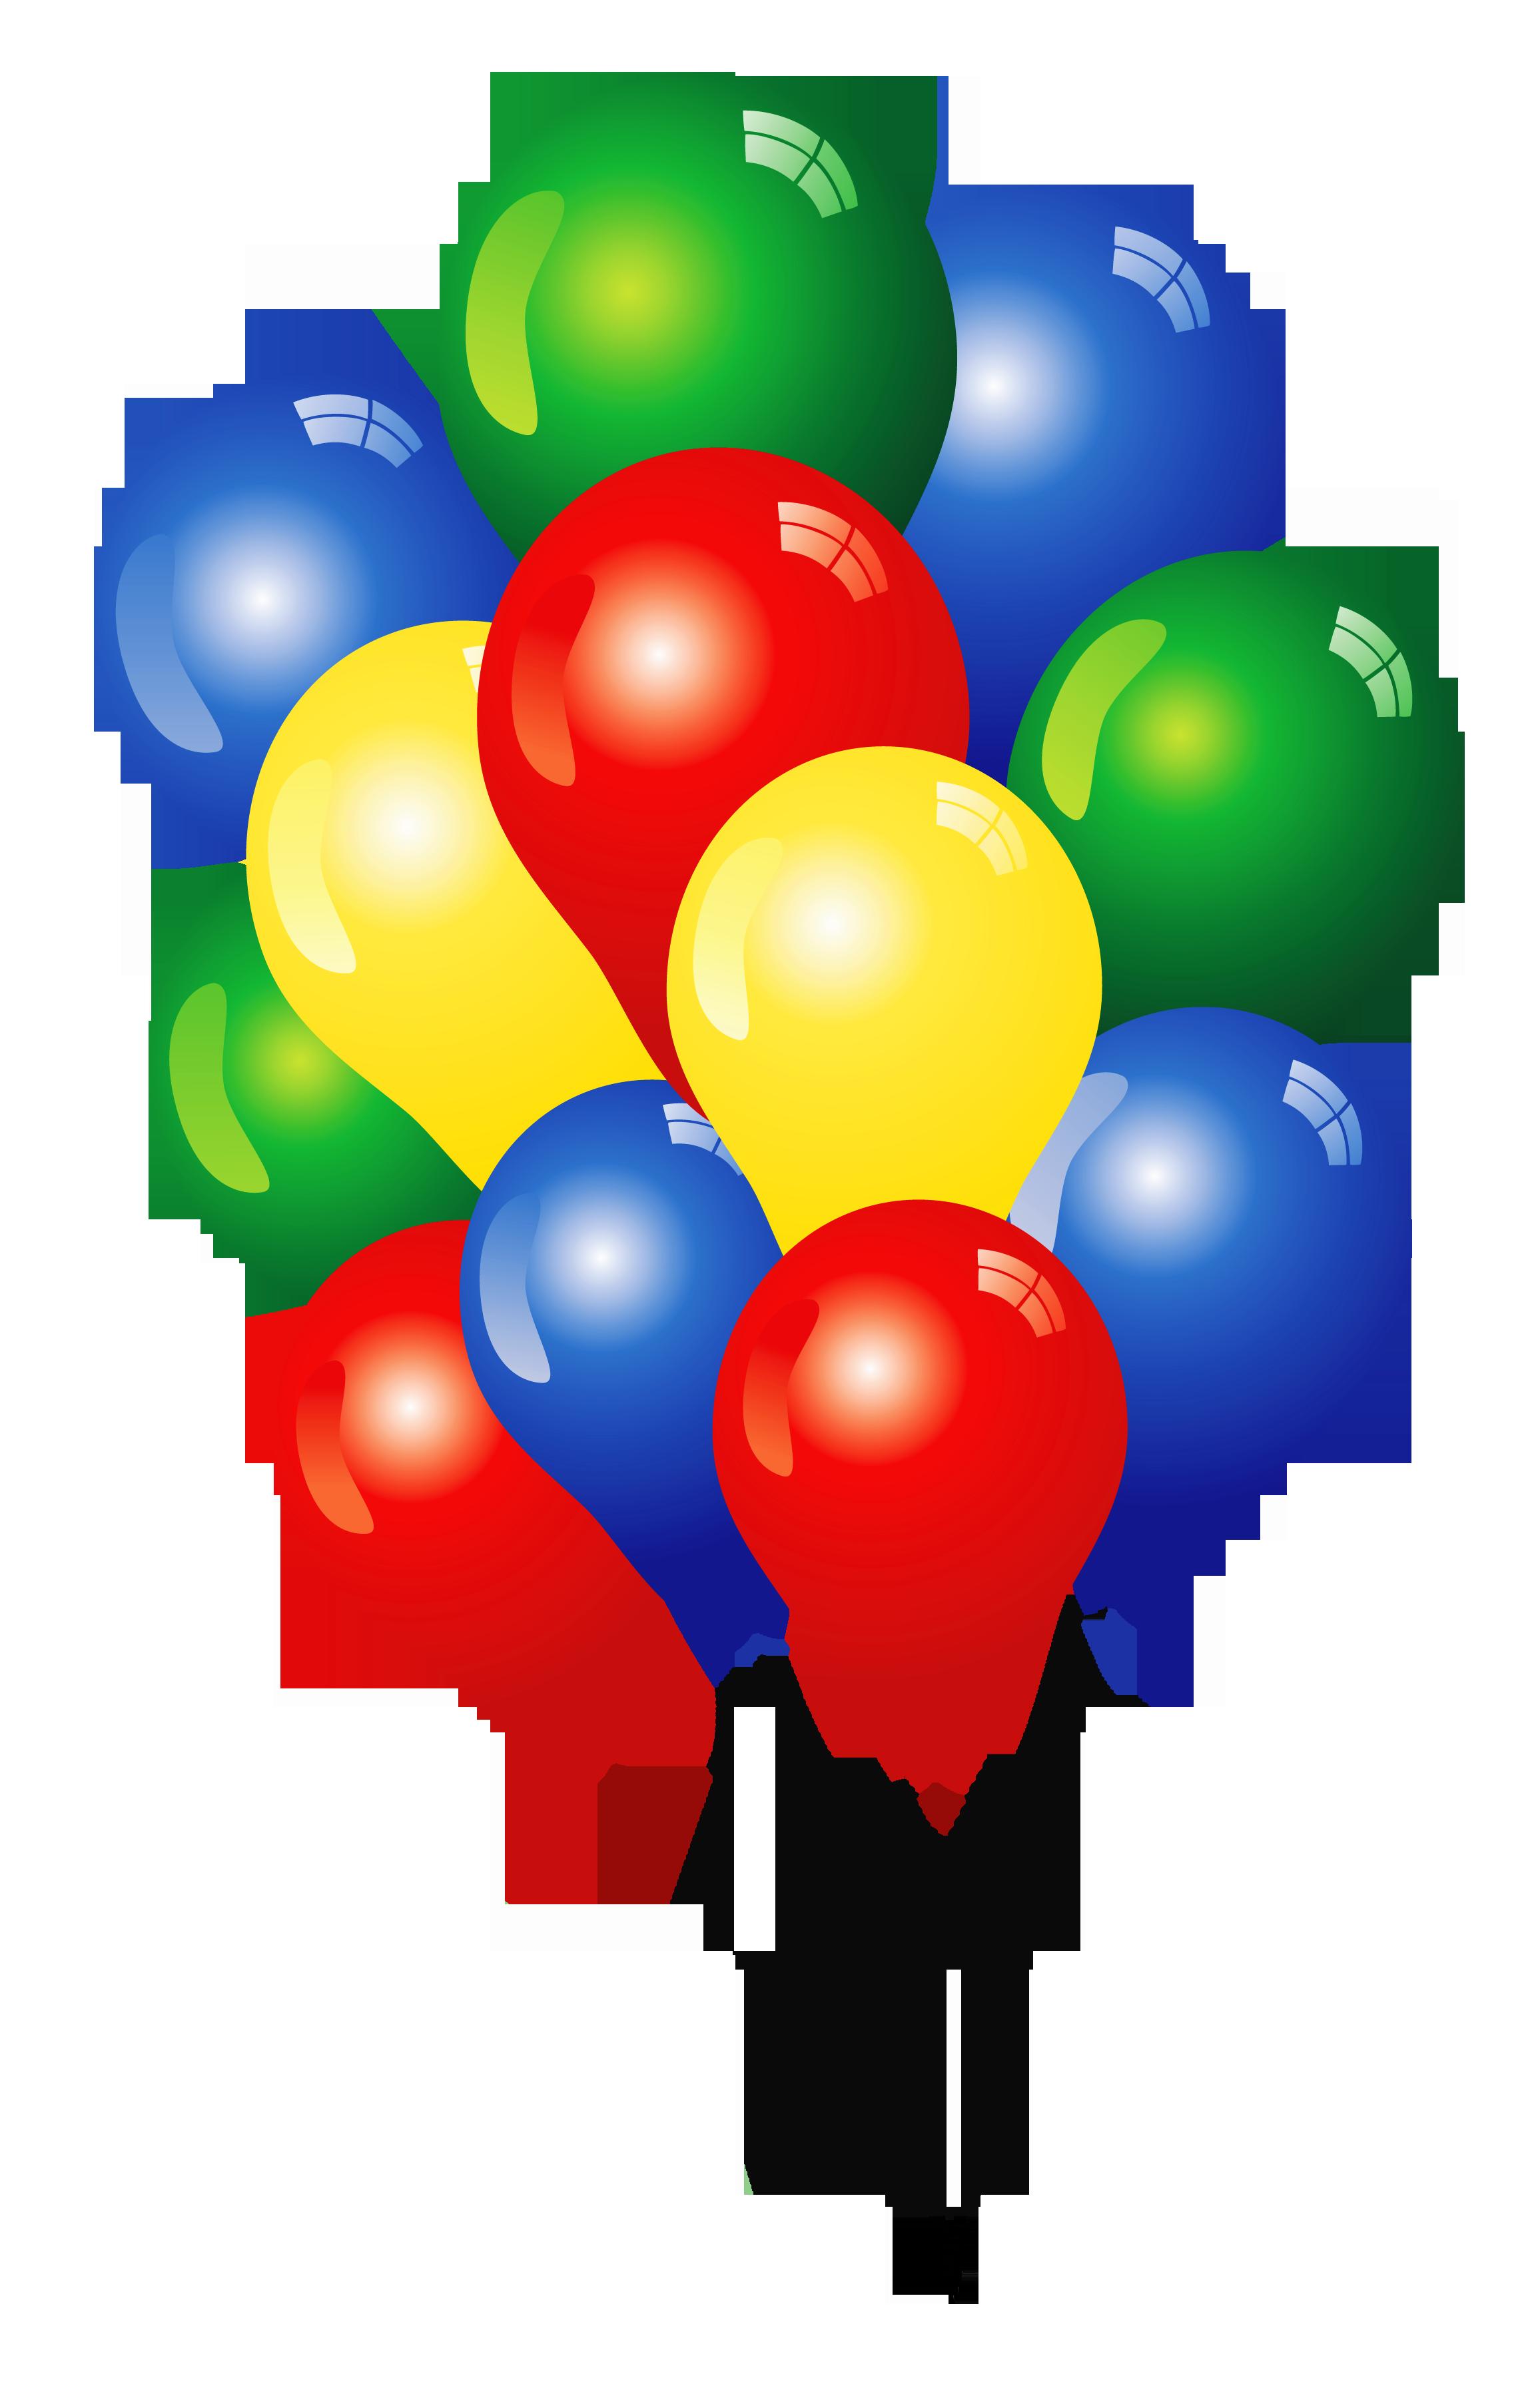 Birthday pumpkin clipart image download Free Microsoft Cliparts Balloons, Download Free Clip Art, Free Clip ... image download